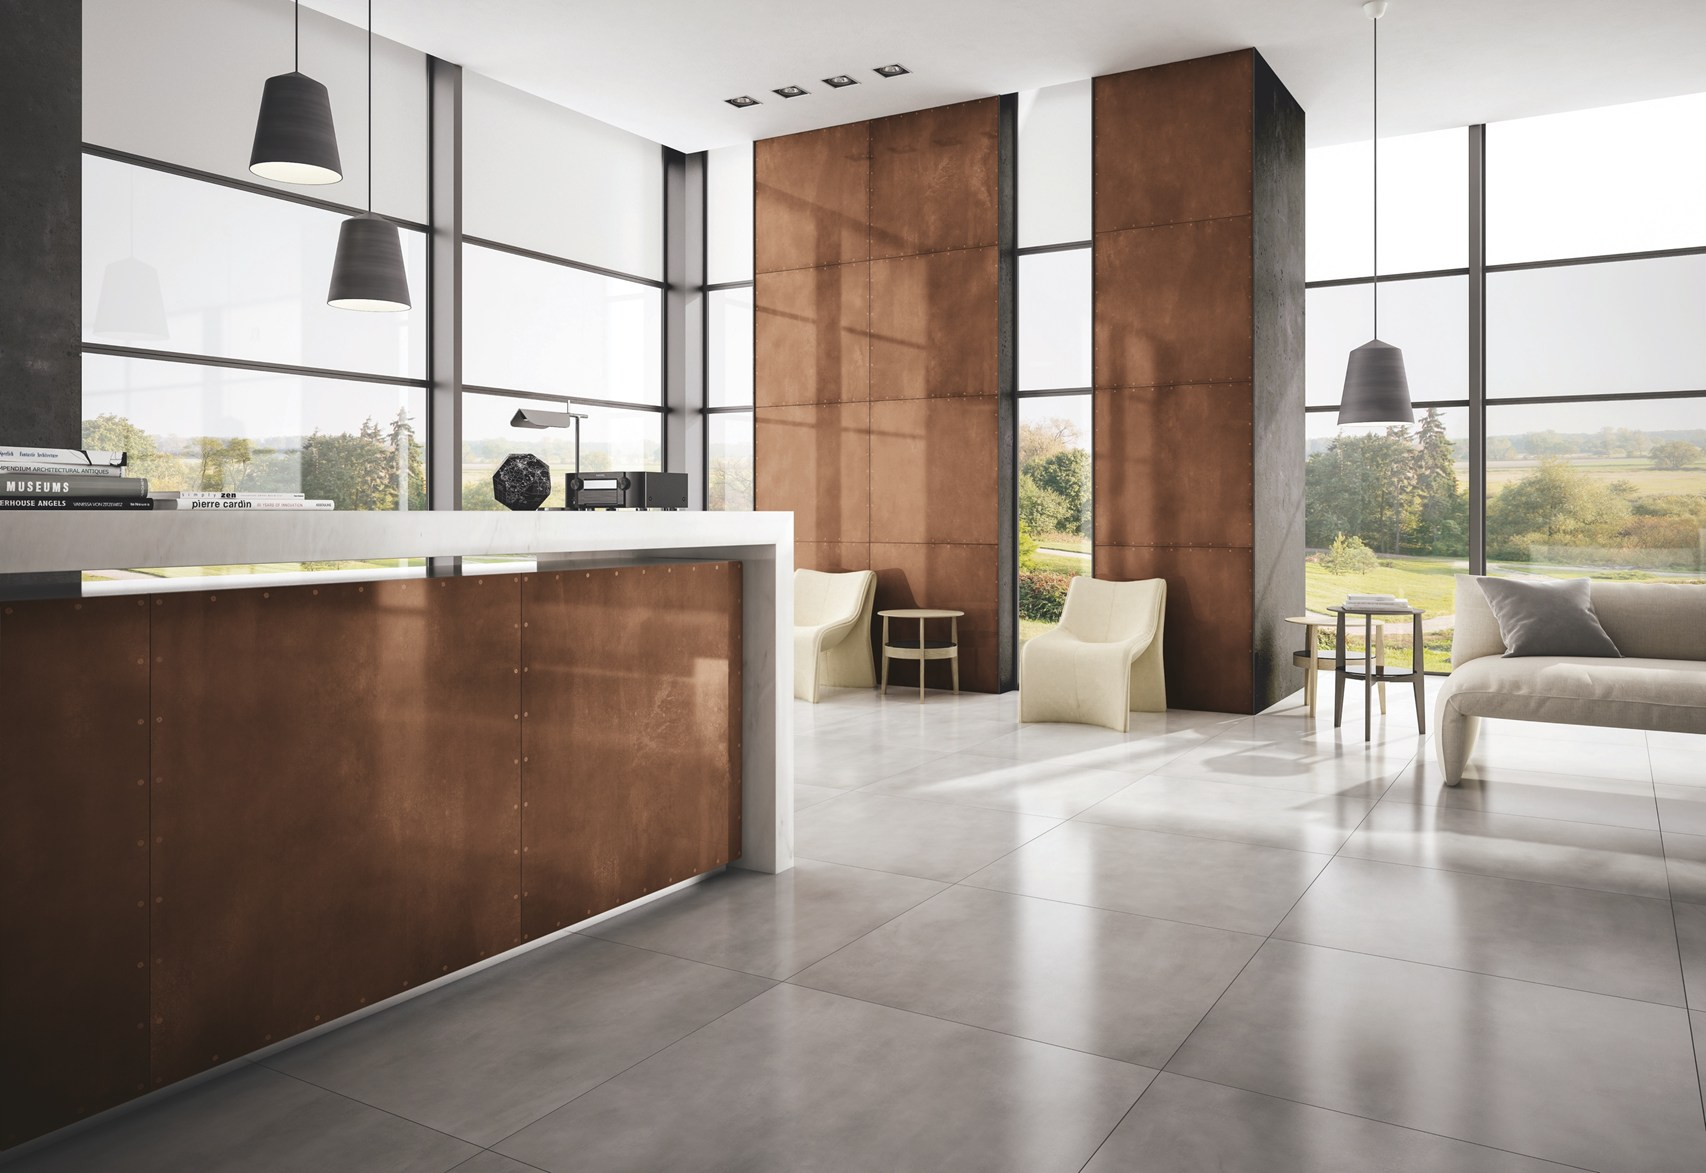 metallo acciaio corten cromatismi tortora. Black Bedroom Furniture Sets. Home Design Ideas